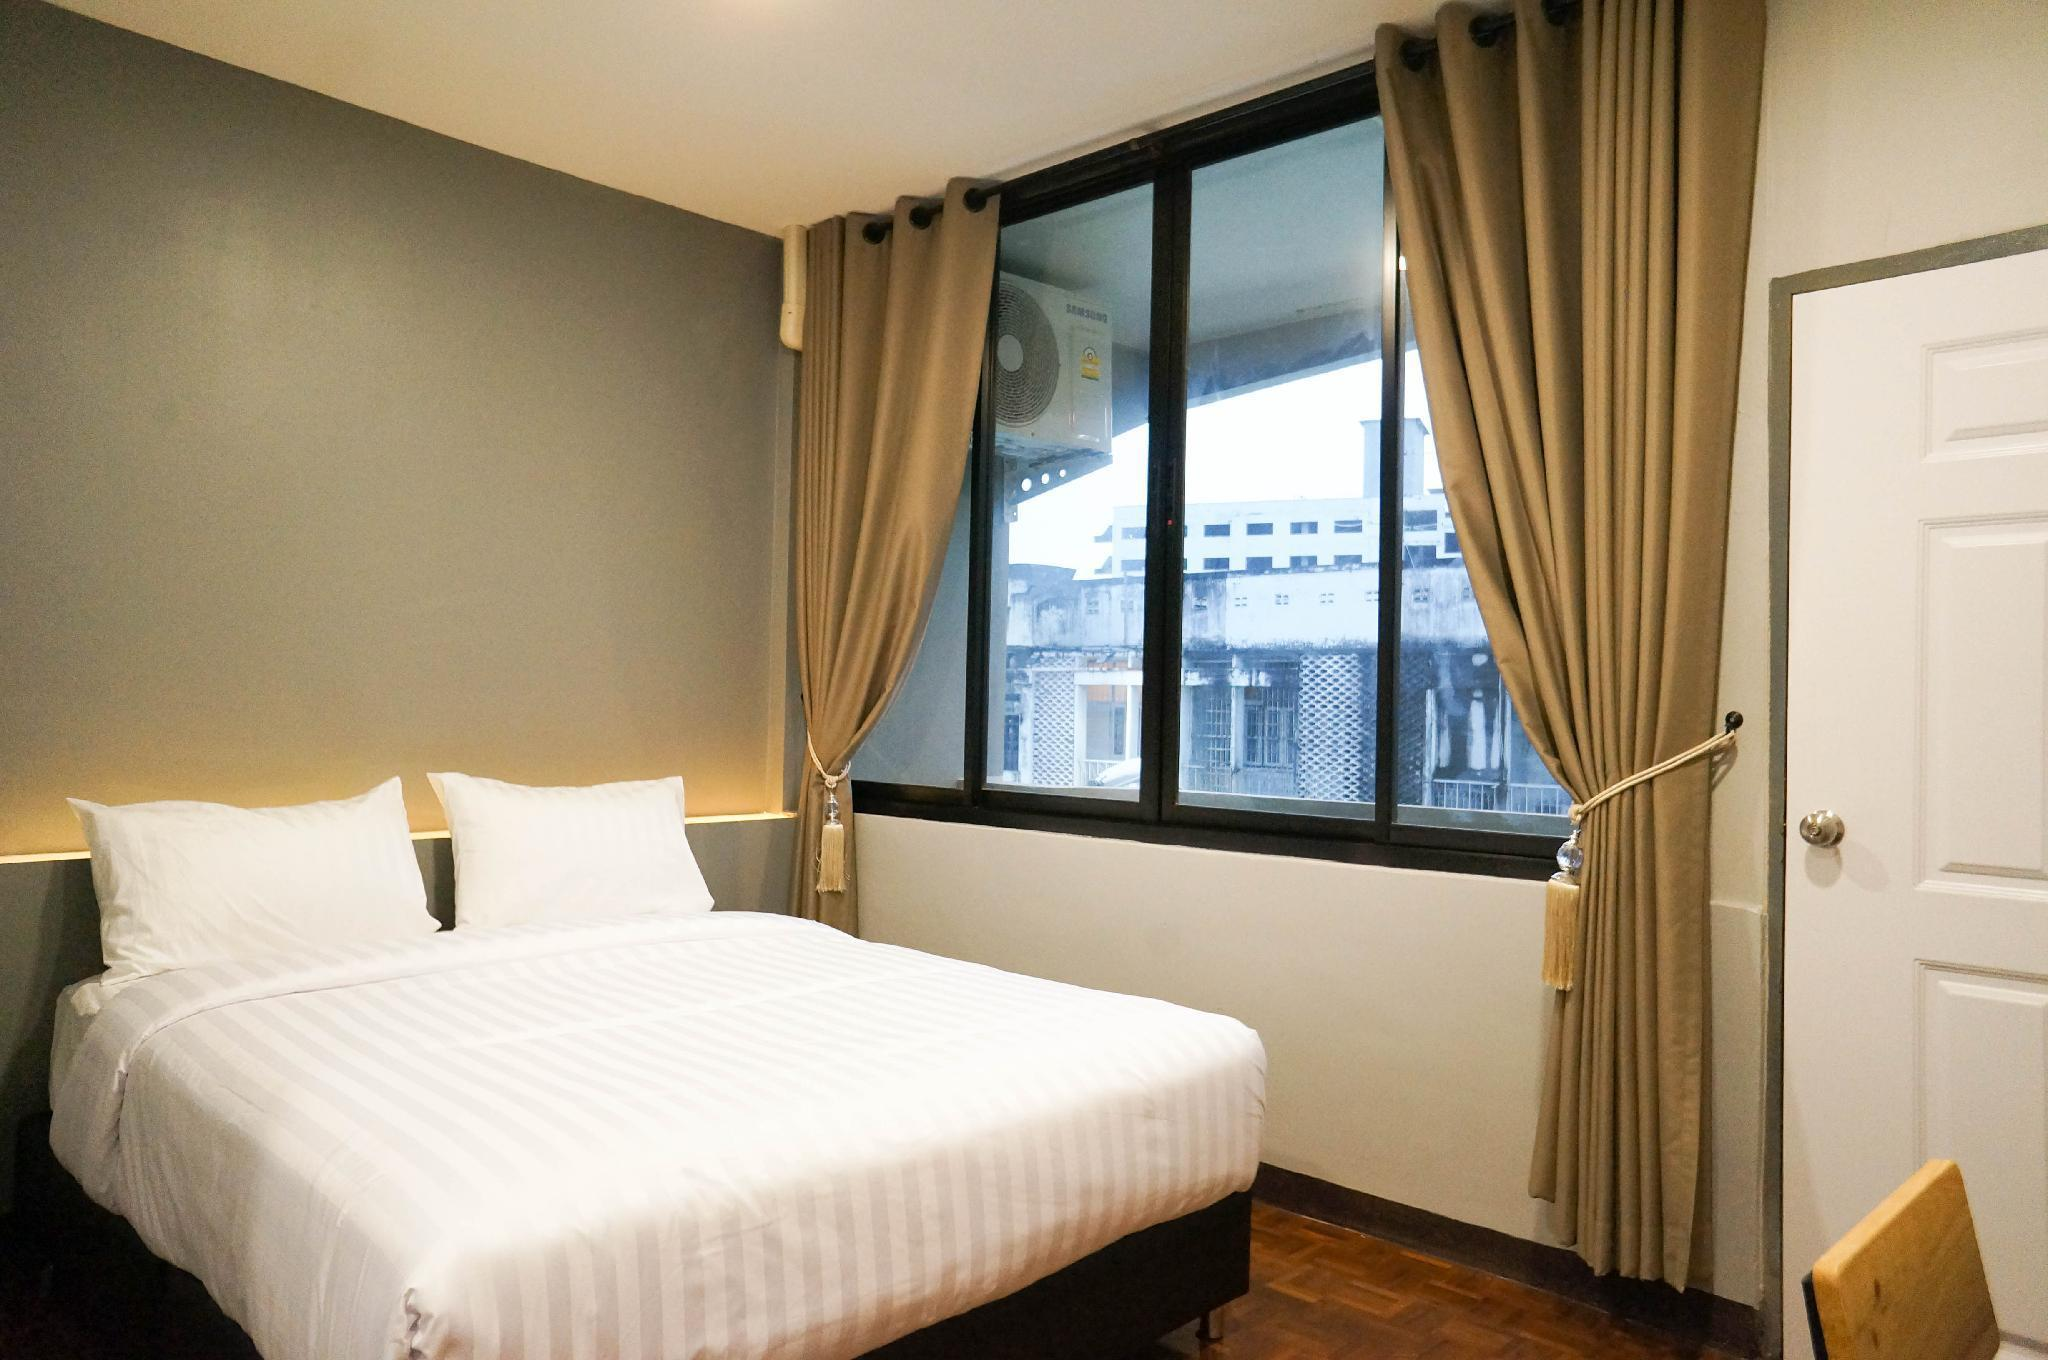 7#Lux Rooms Night Bazaar-Double Bed Studio Balcony สตูดิโอ อพาร์ตเมนต์ 1 ห้องน้ำส่วนตัว ขนาด 20 ตร.ม. – ไนท์บาร์ซา